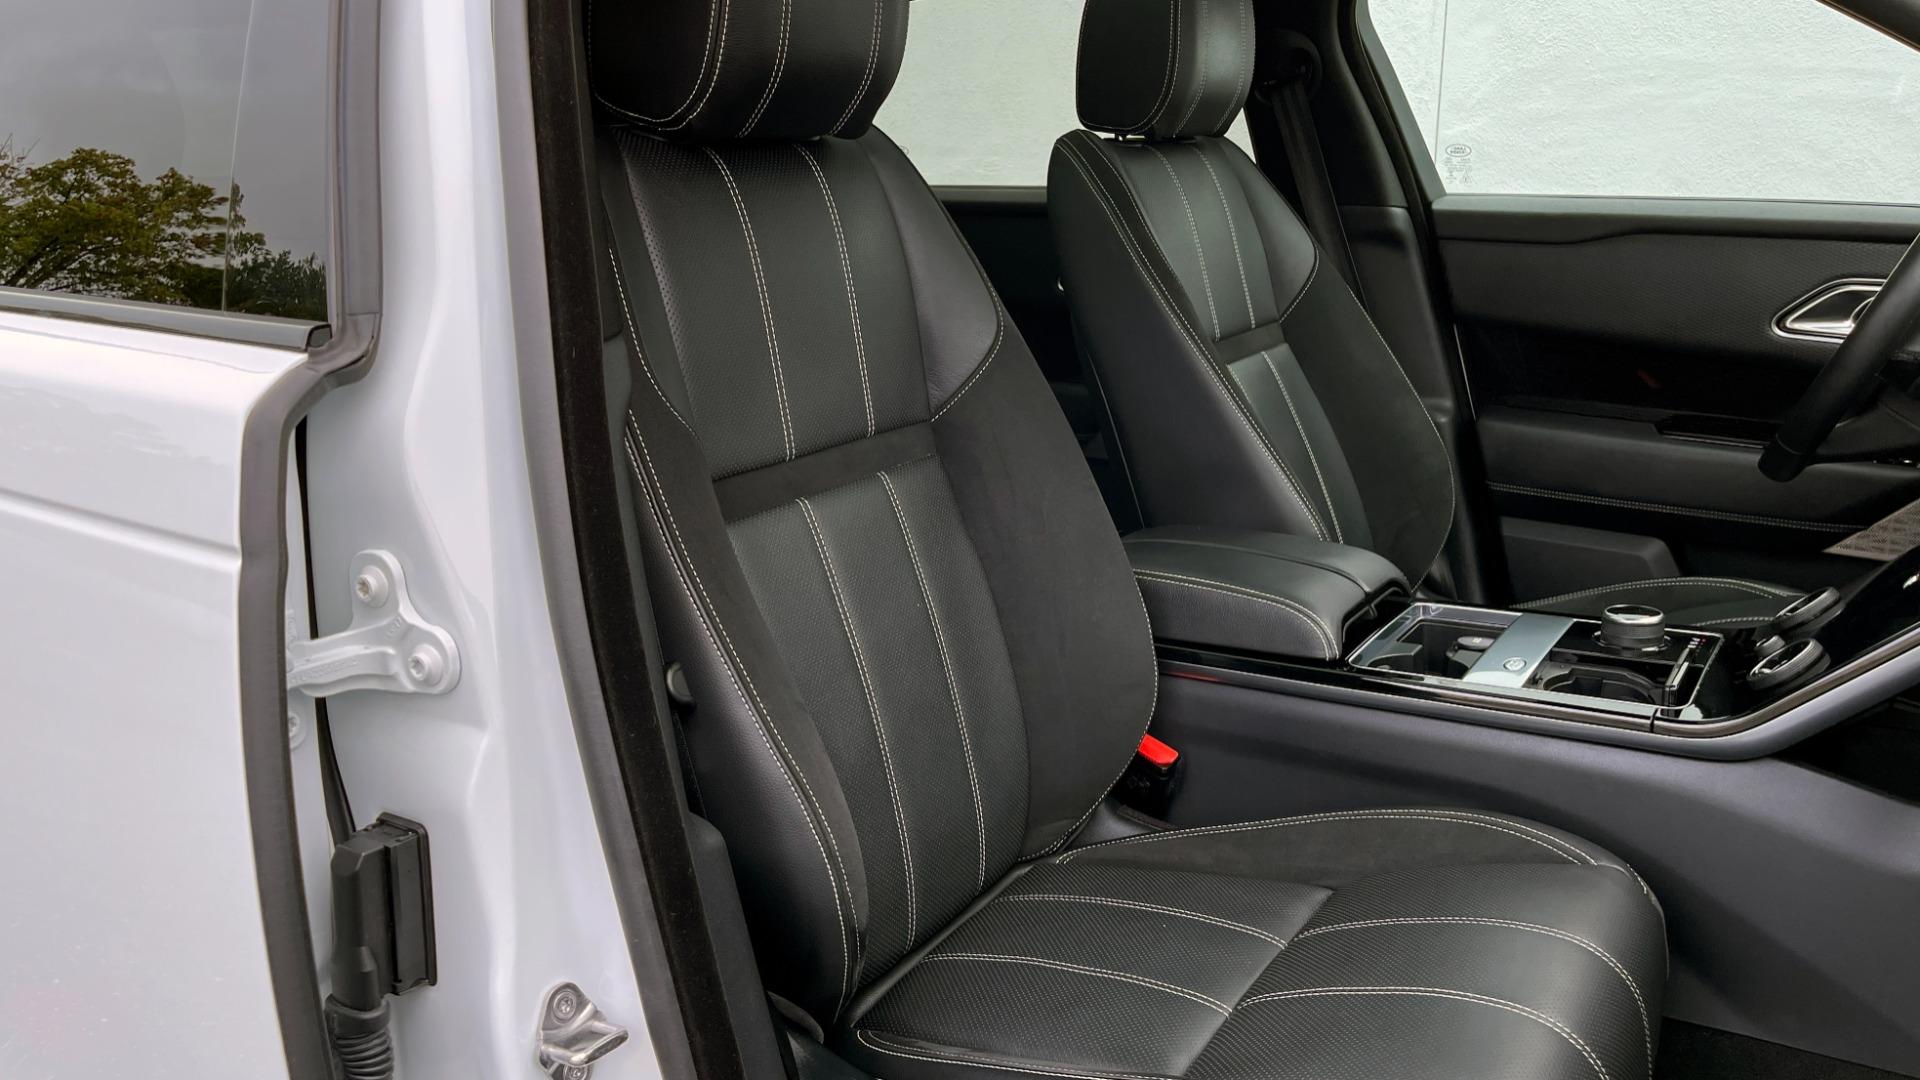 Used 2018 Land Rover RANGE ROVER VELAR R-DYNAMIC SE / NAV / PREM / MERIDIAN / SUNROOF / REARVIEW for sale $54,995 at Formula Imports in Charlotte NC 28227 64